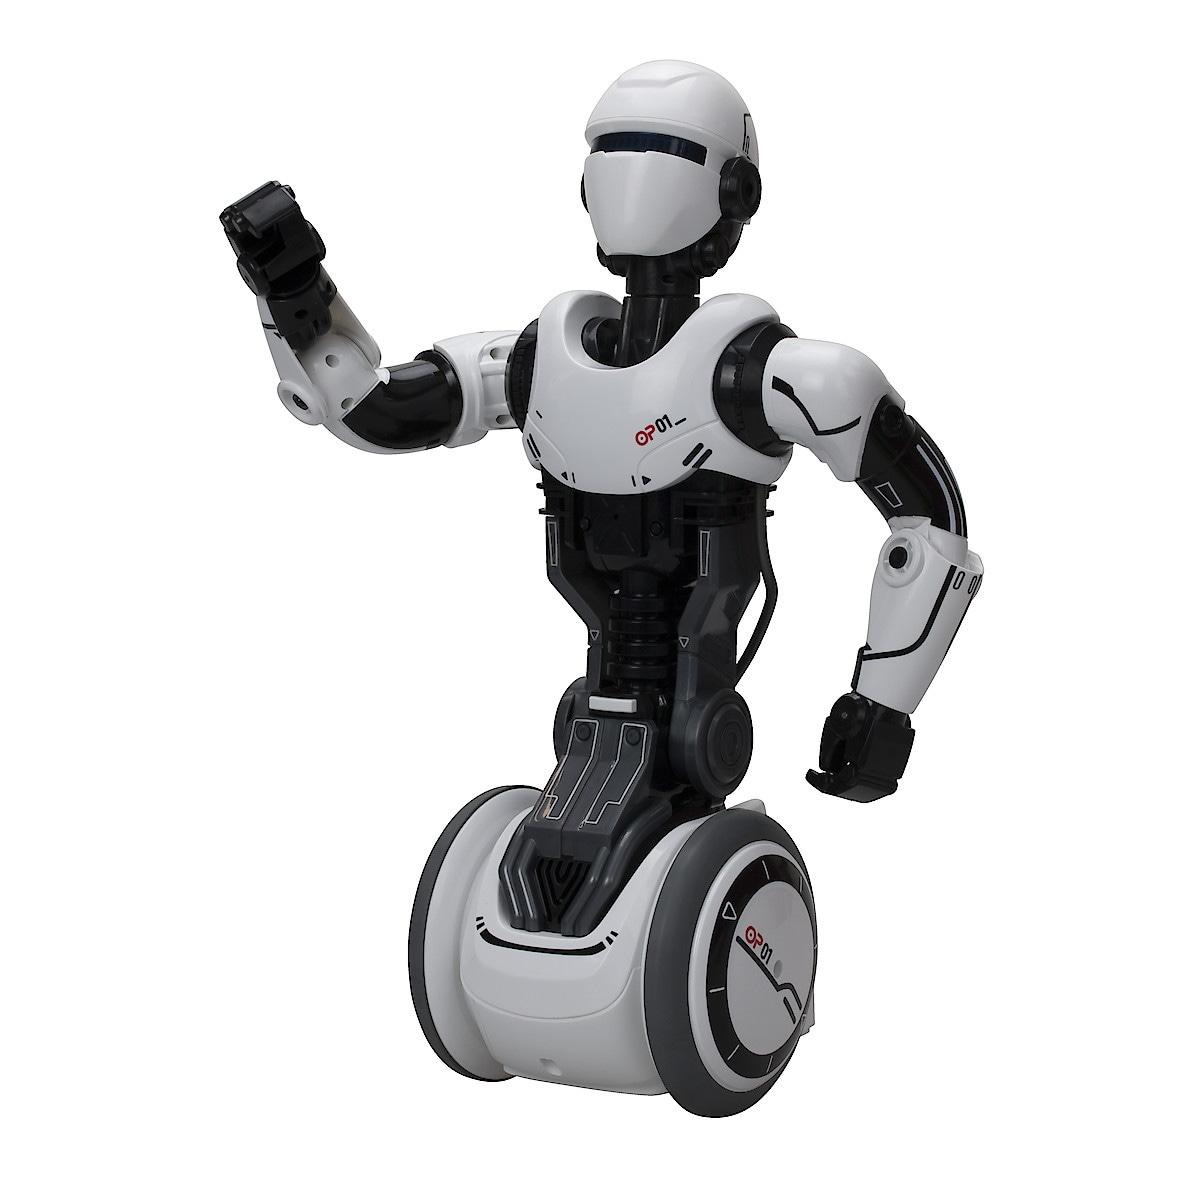 Silverlit OP One robot